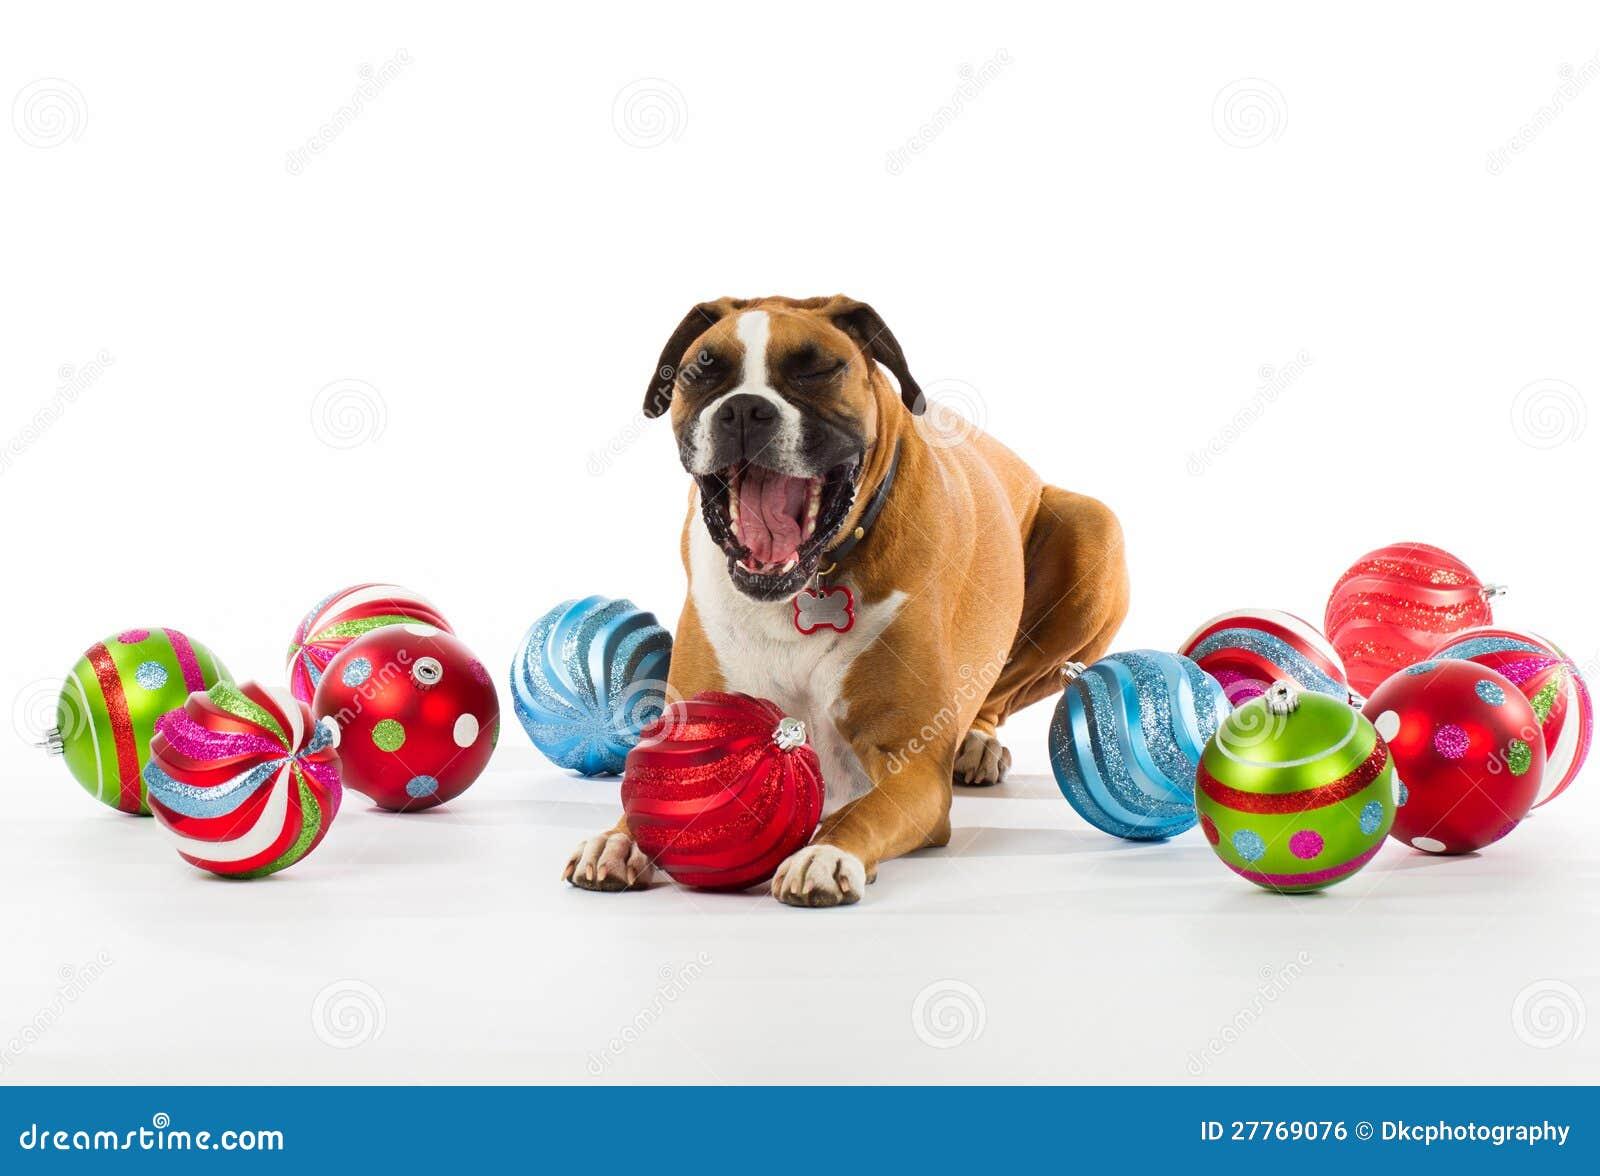 Dog christmas ornaments - Boxer Dog With Christmas Ornaments Royalty Free Stock Image